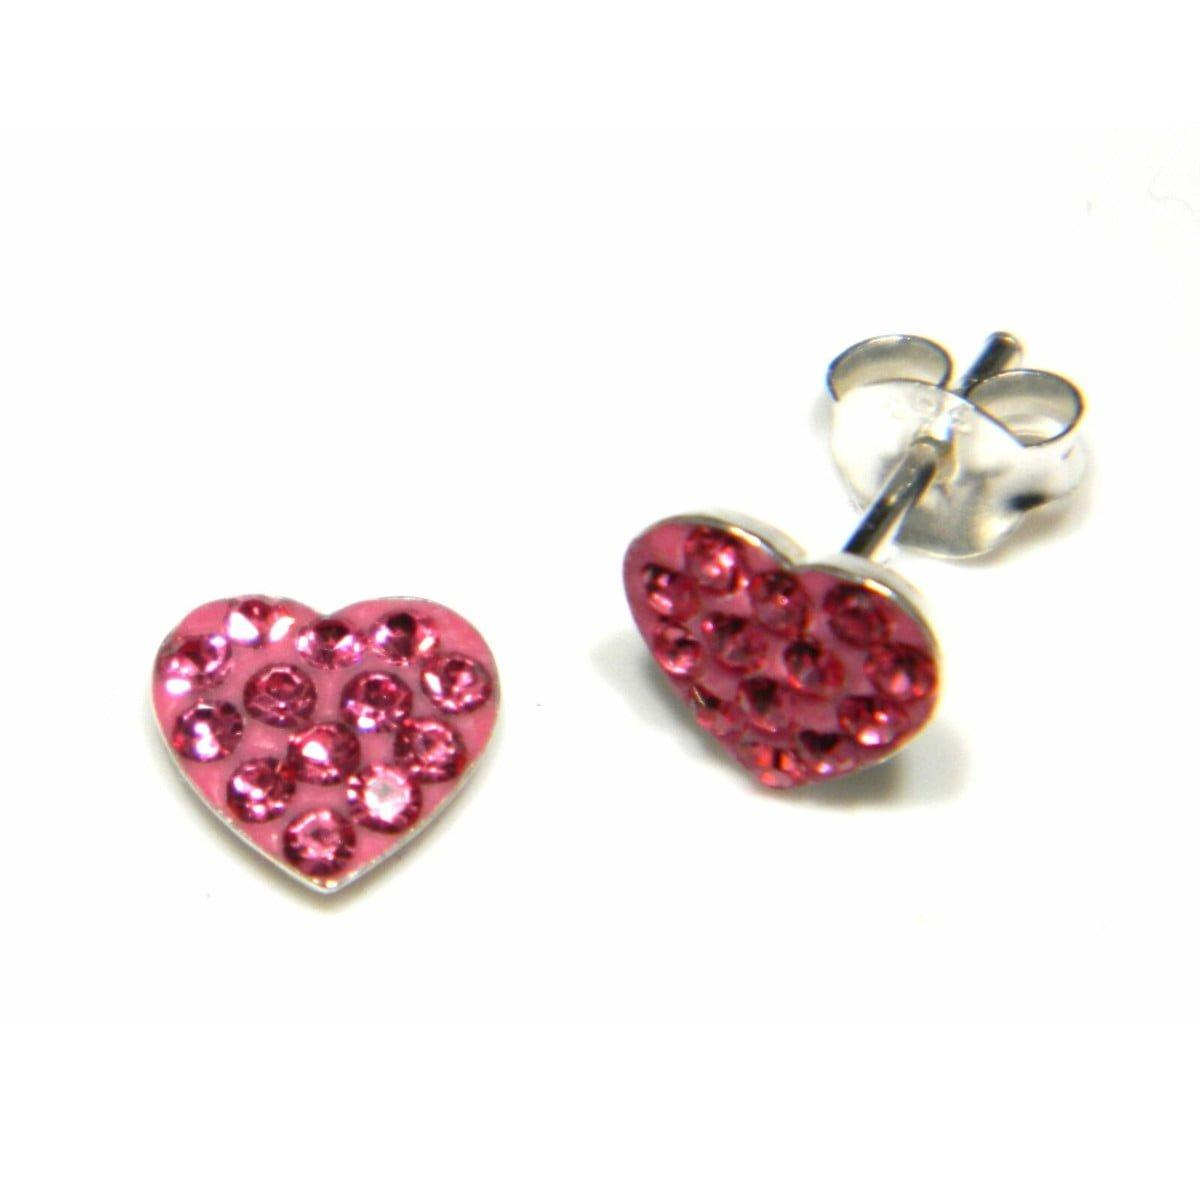 7 mm pink coloured crystal heart stud earrings in sterling silver